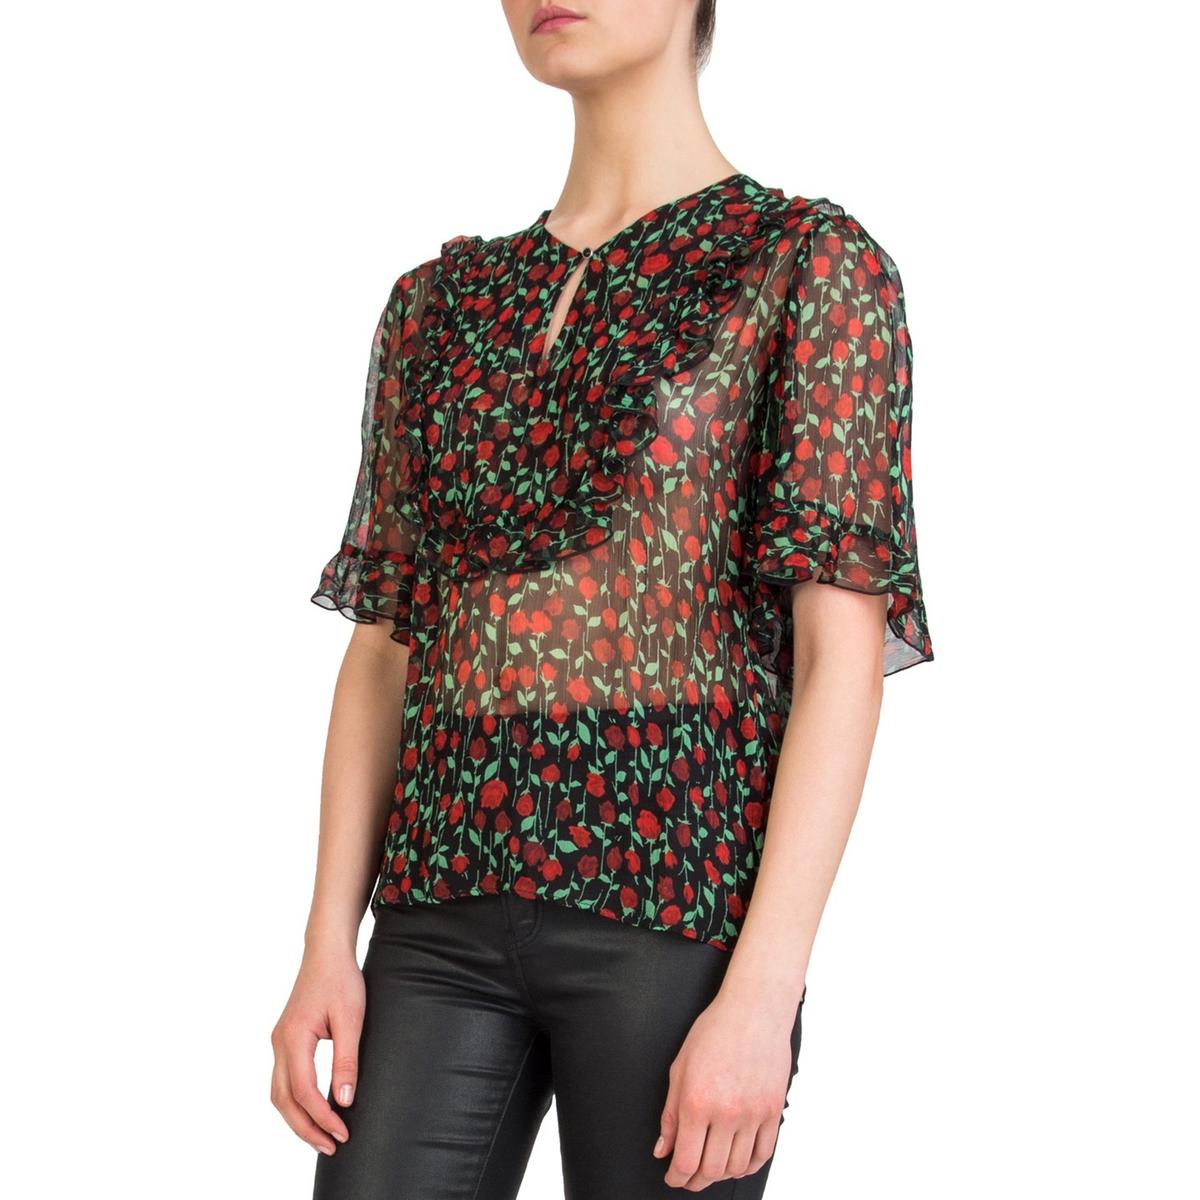 Блузка с рисунком, воланами и короткими рукавами блузка с рисунком и накладными воланами